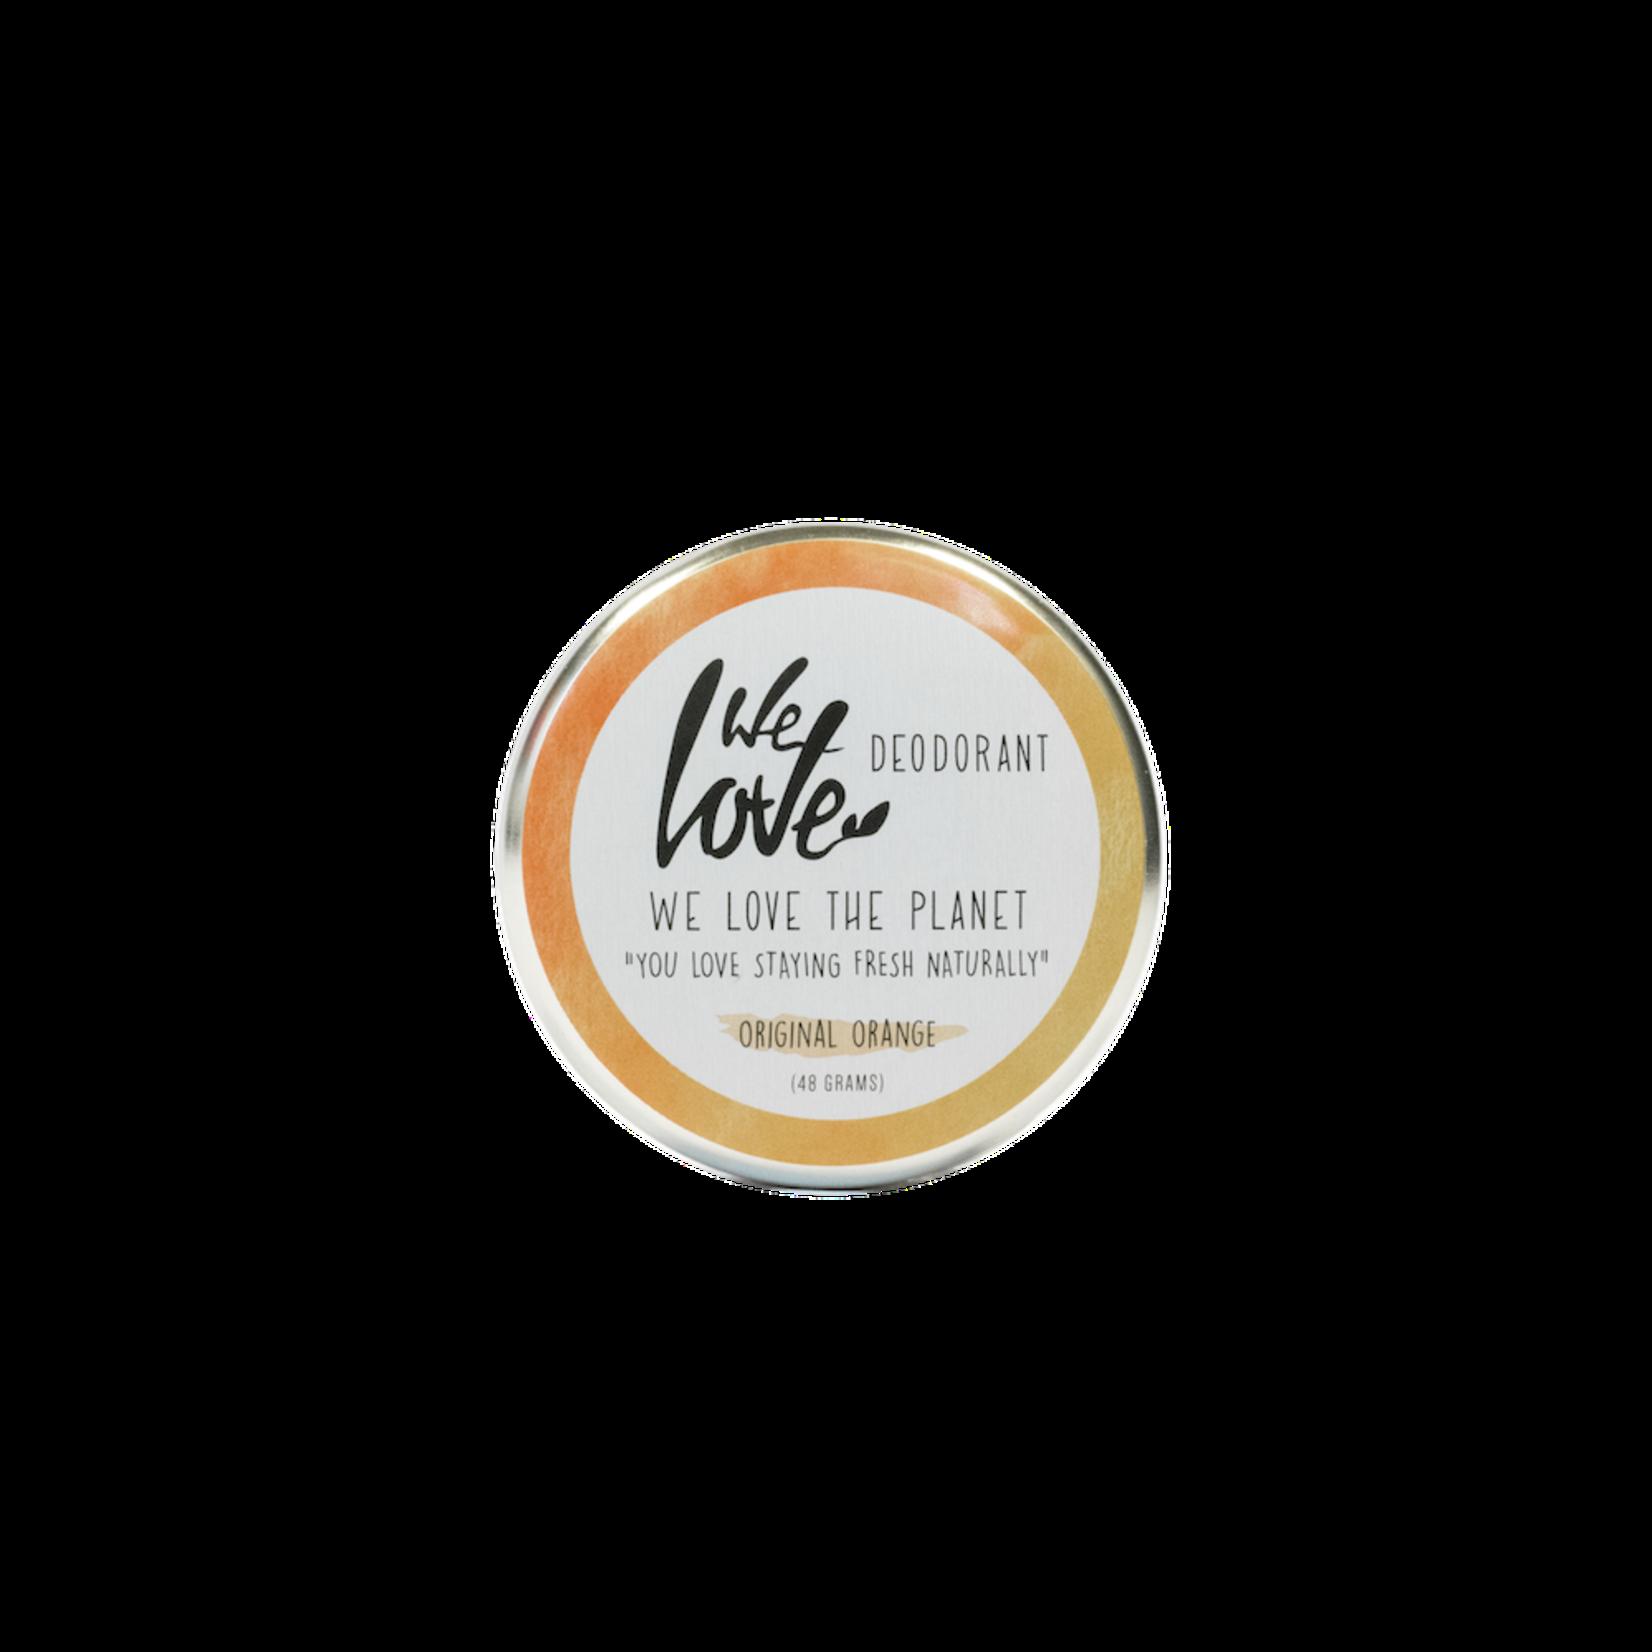 WLTP We Love The Planet - Deodorant - Original Orange - in a tin